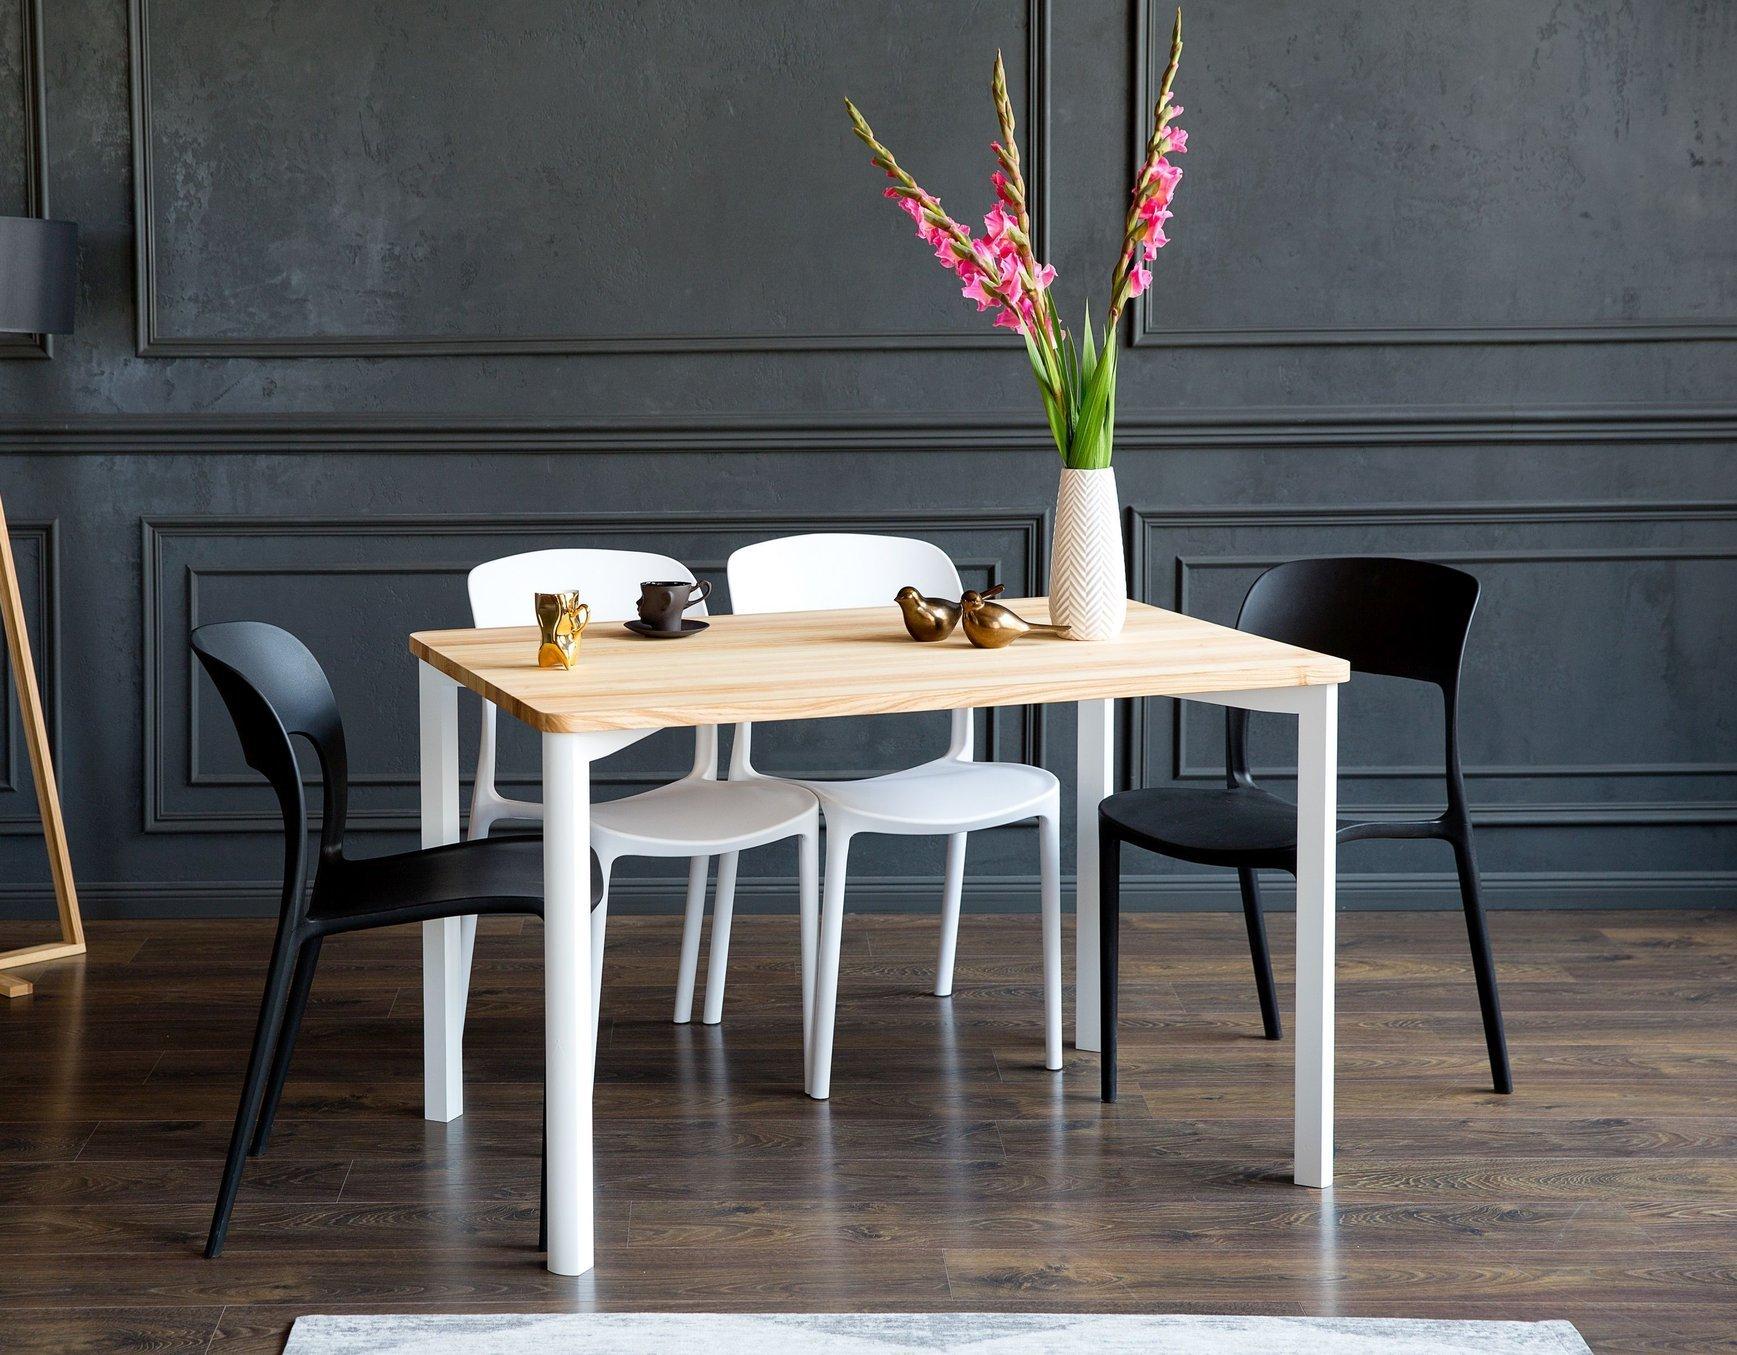 TRIVENTI Ashwood Dining Table 9x9cm   White Round Legs